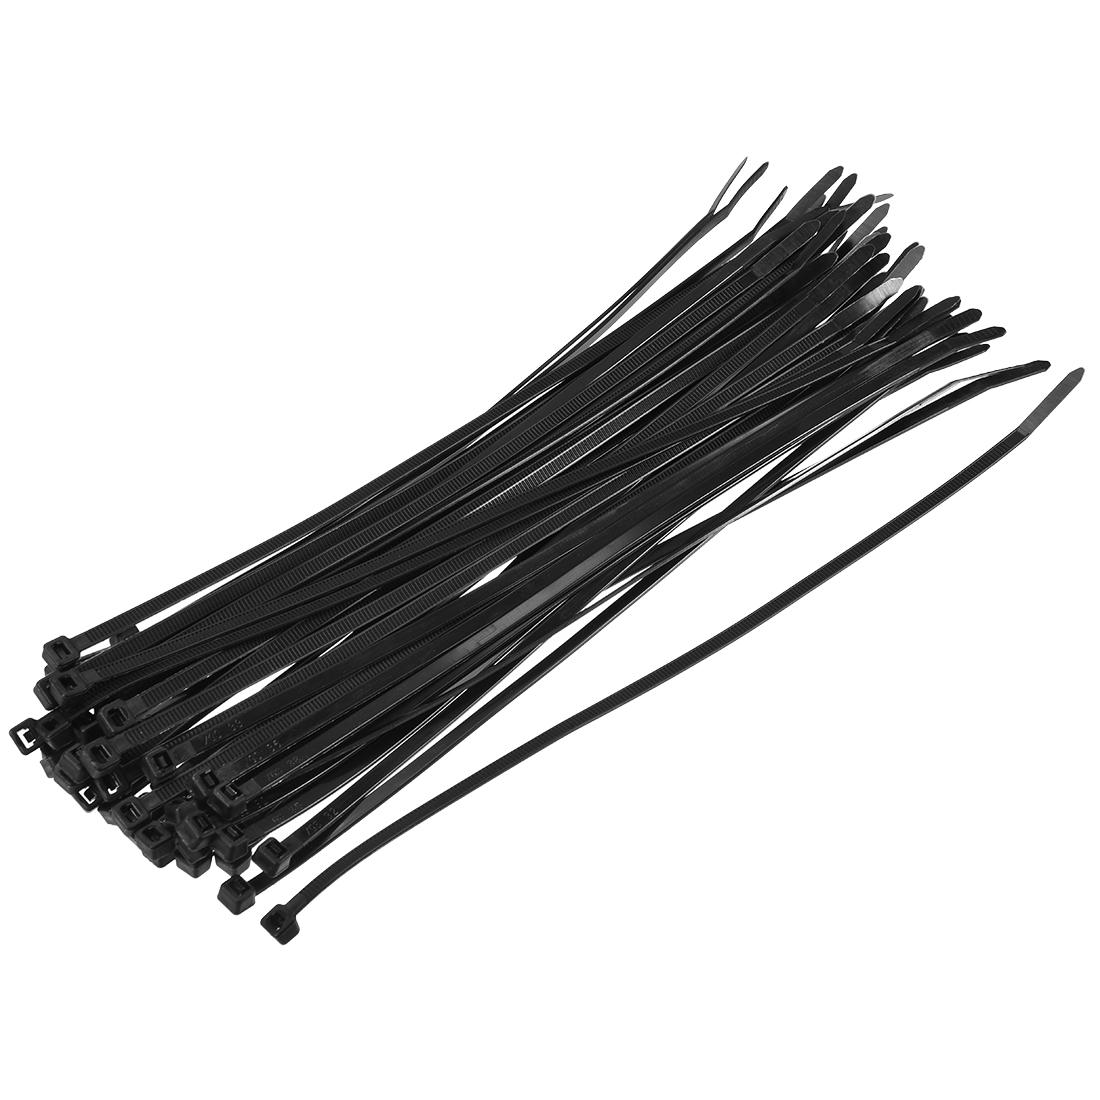 Cable Zip Ties 200mmx3.6mm Self-Locking Nylon Tie Wraps Black 350pcs